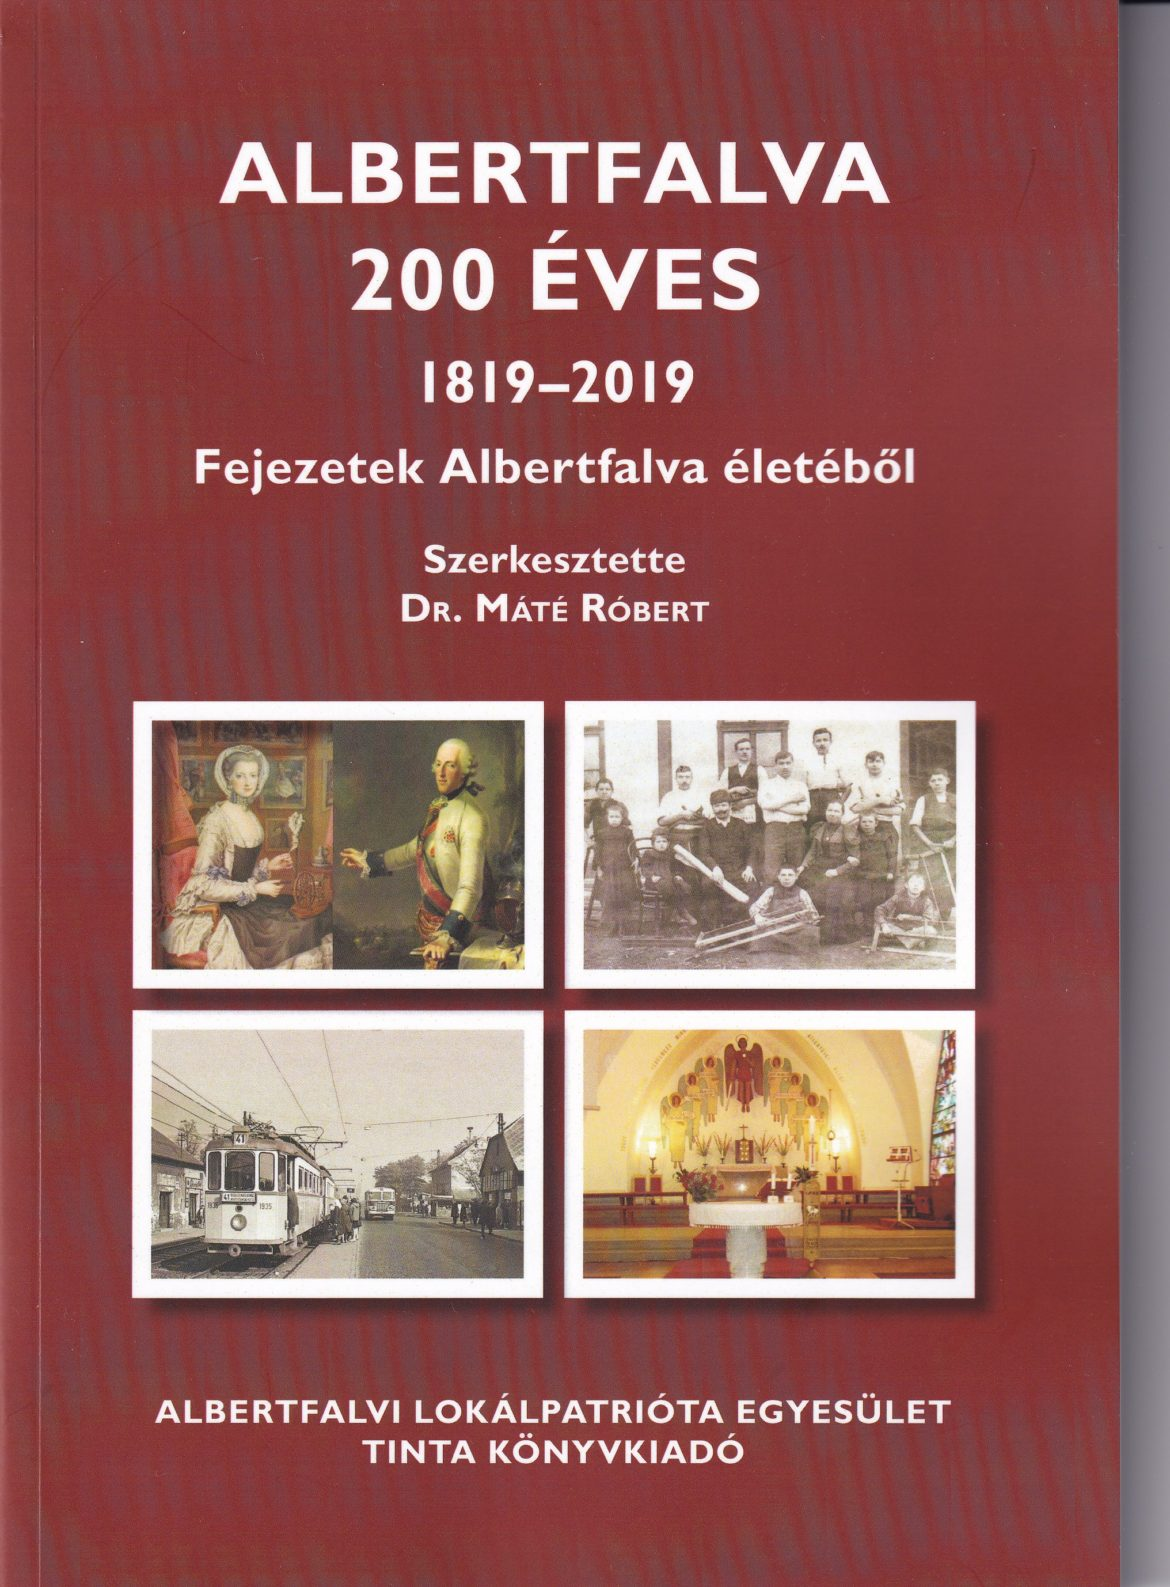 Albertfalva 200 éves